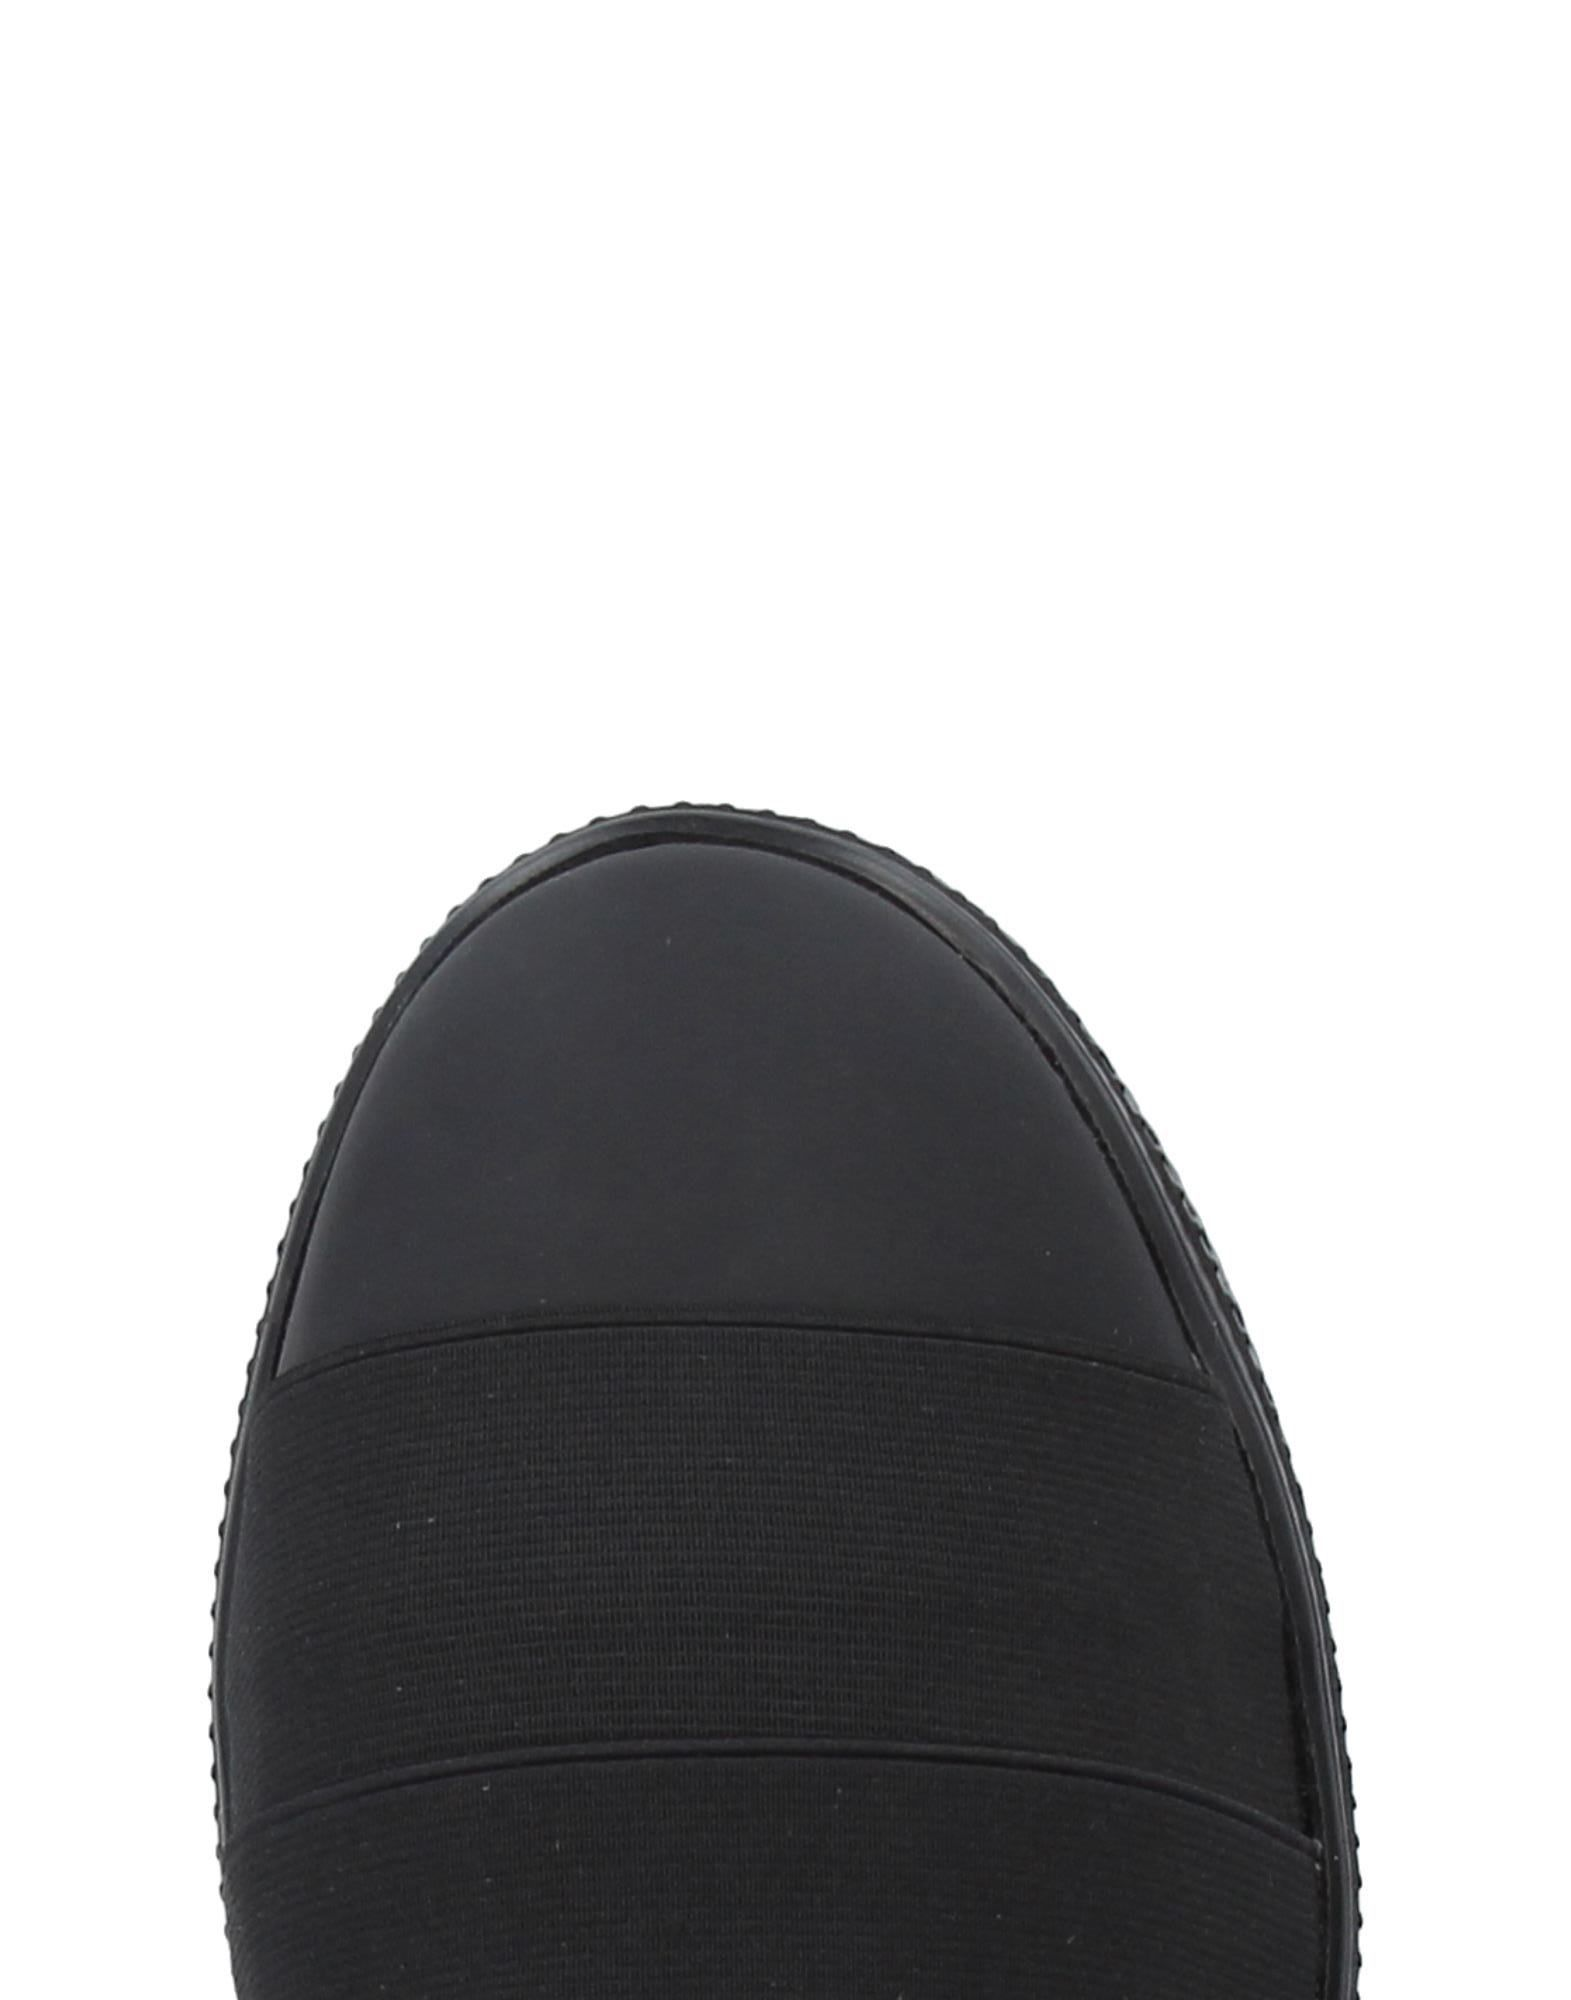 Fessura Sneakers Damen  11385655QE 11385655QE 11385655QE Gute Qualität beliebte Schuhe fdd088